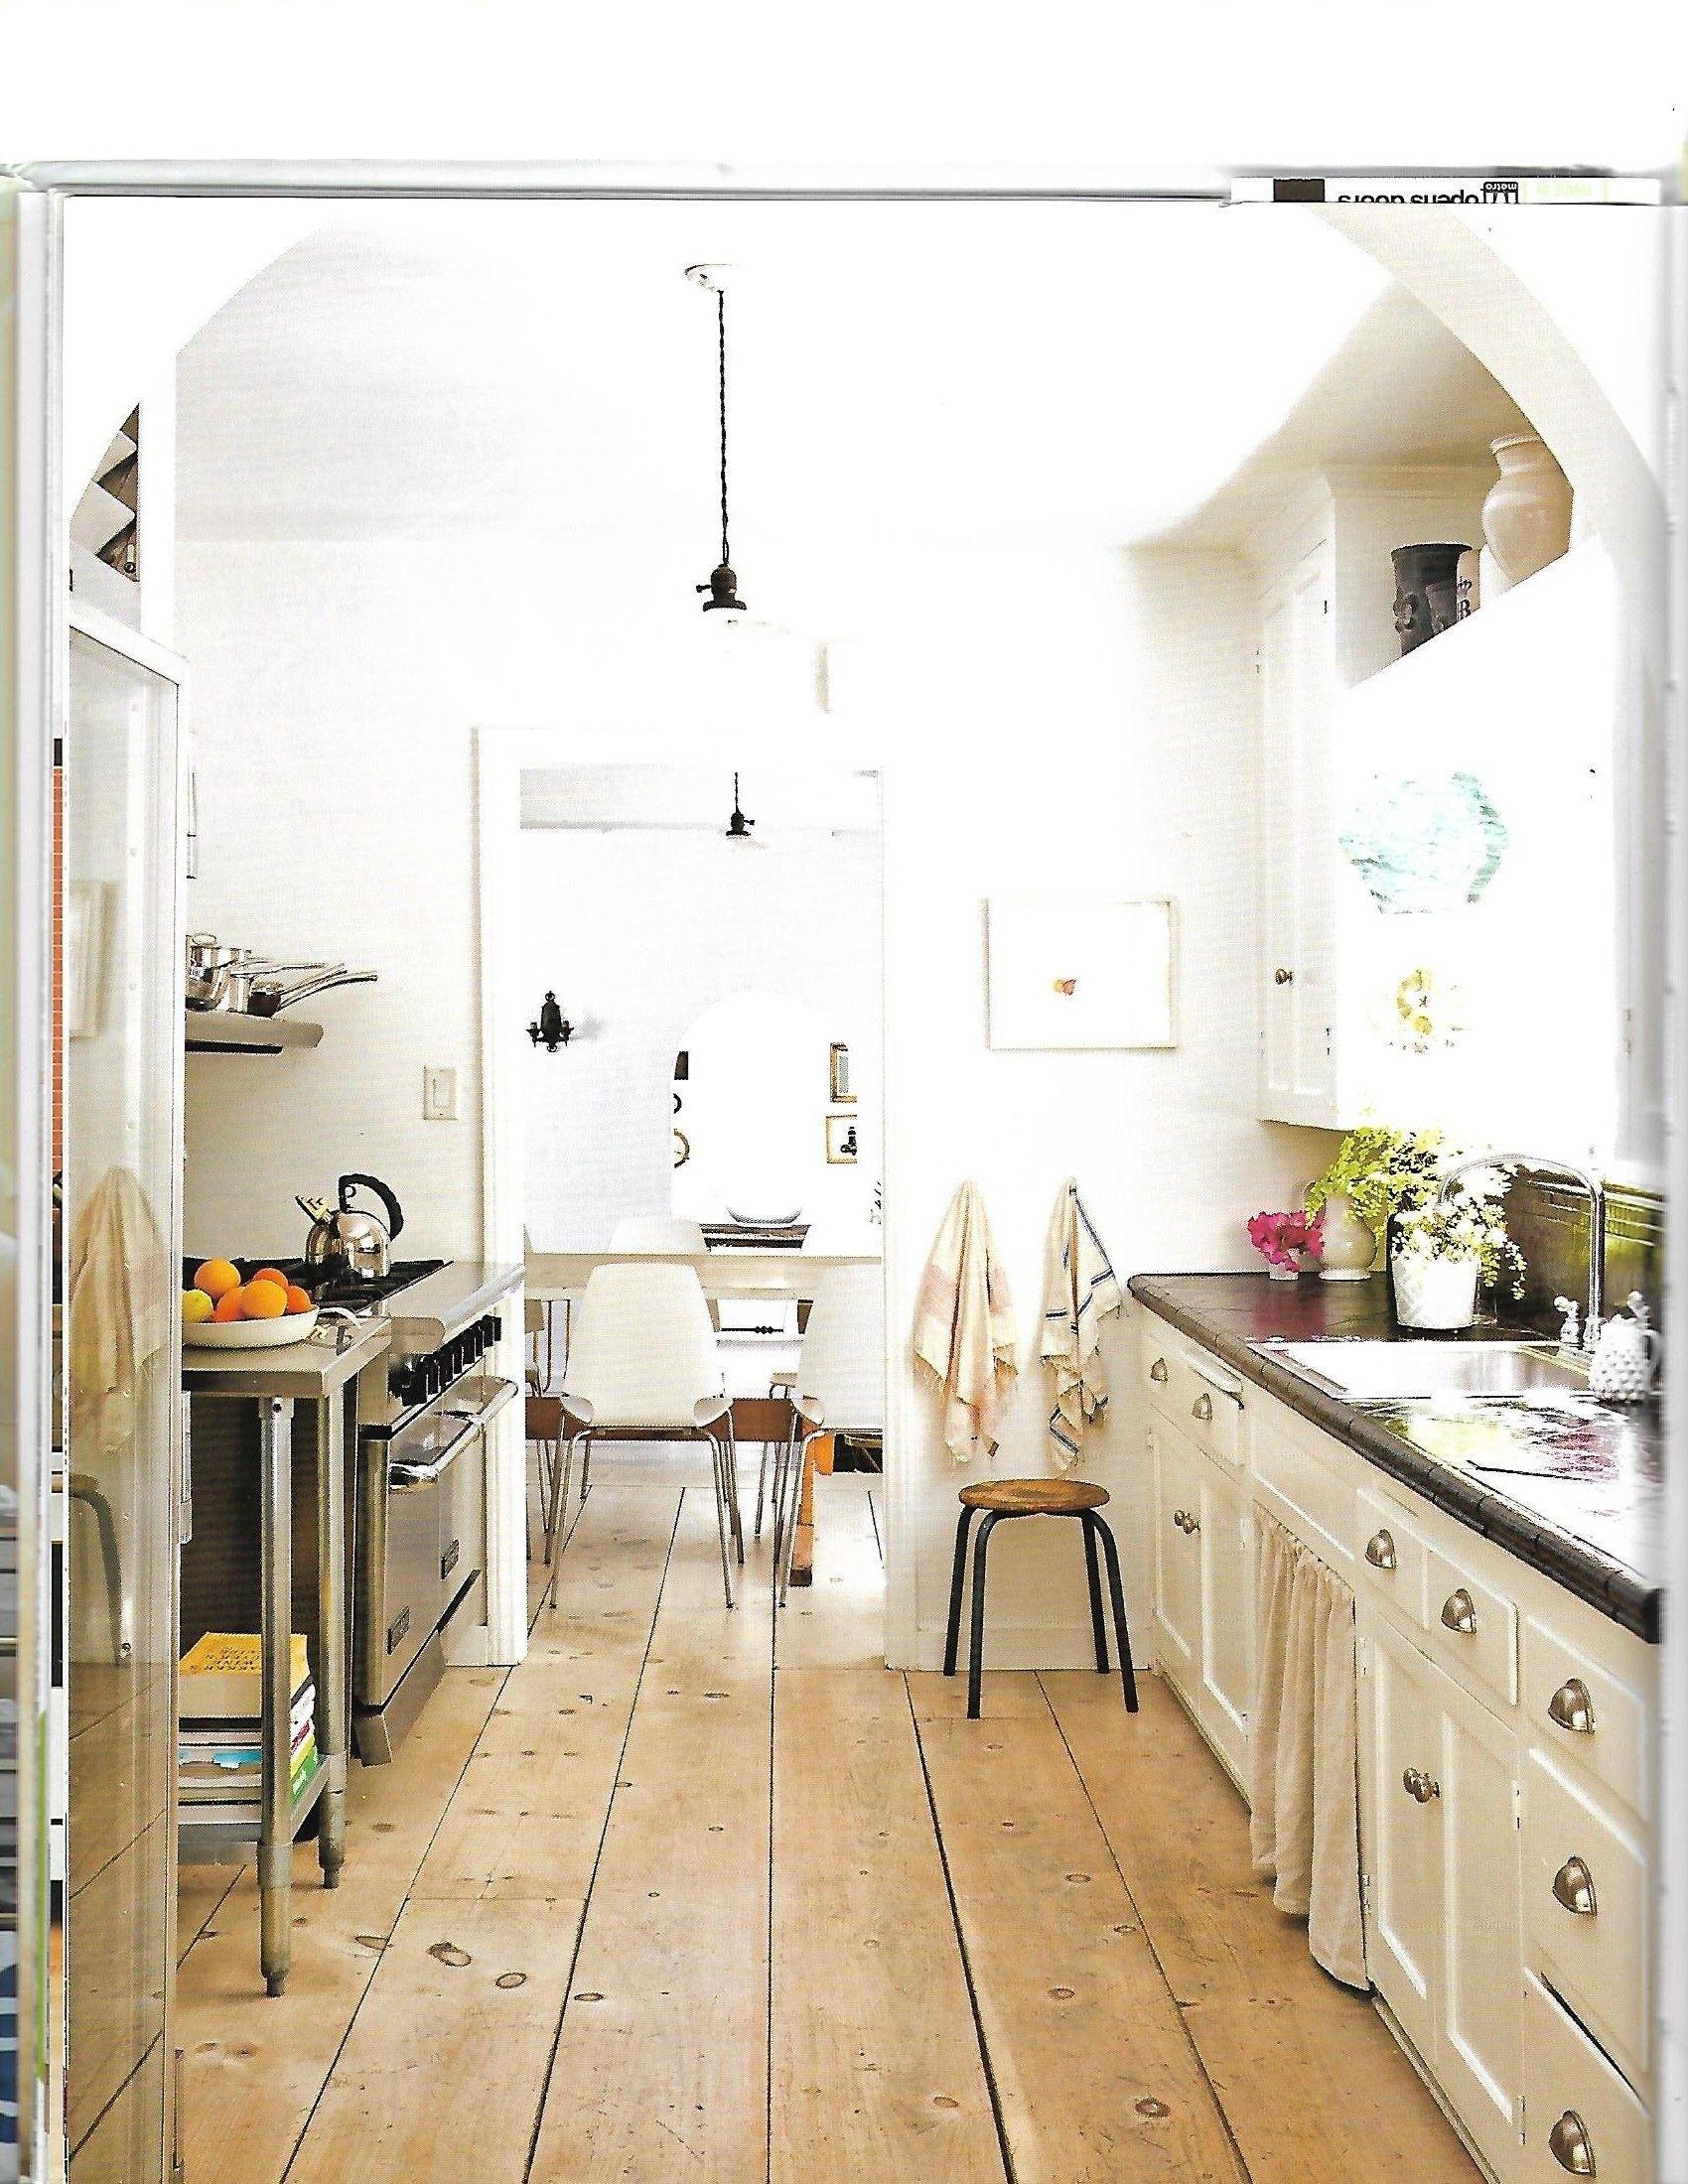 just like black kitchen countertops black countertops home decor on kitchen decor black countertop id=58820